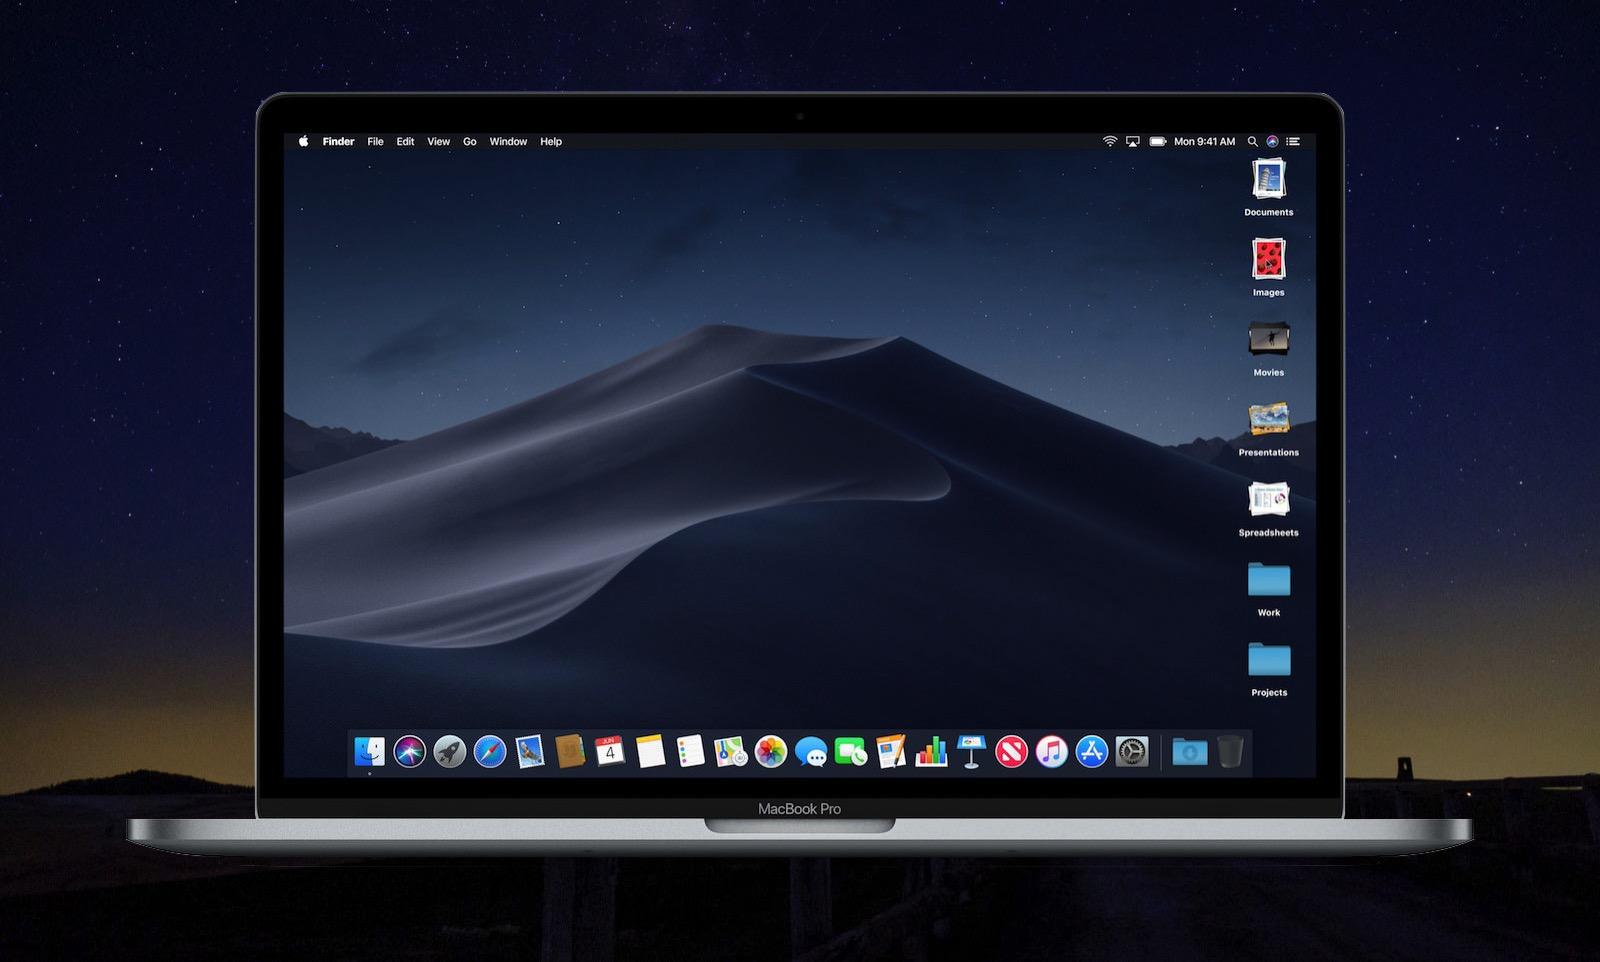 macOS_preview_Stacks_Finder_screen_06042018.jpg